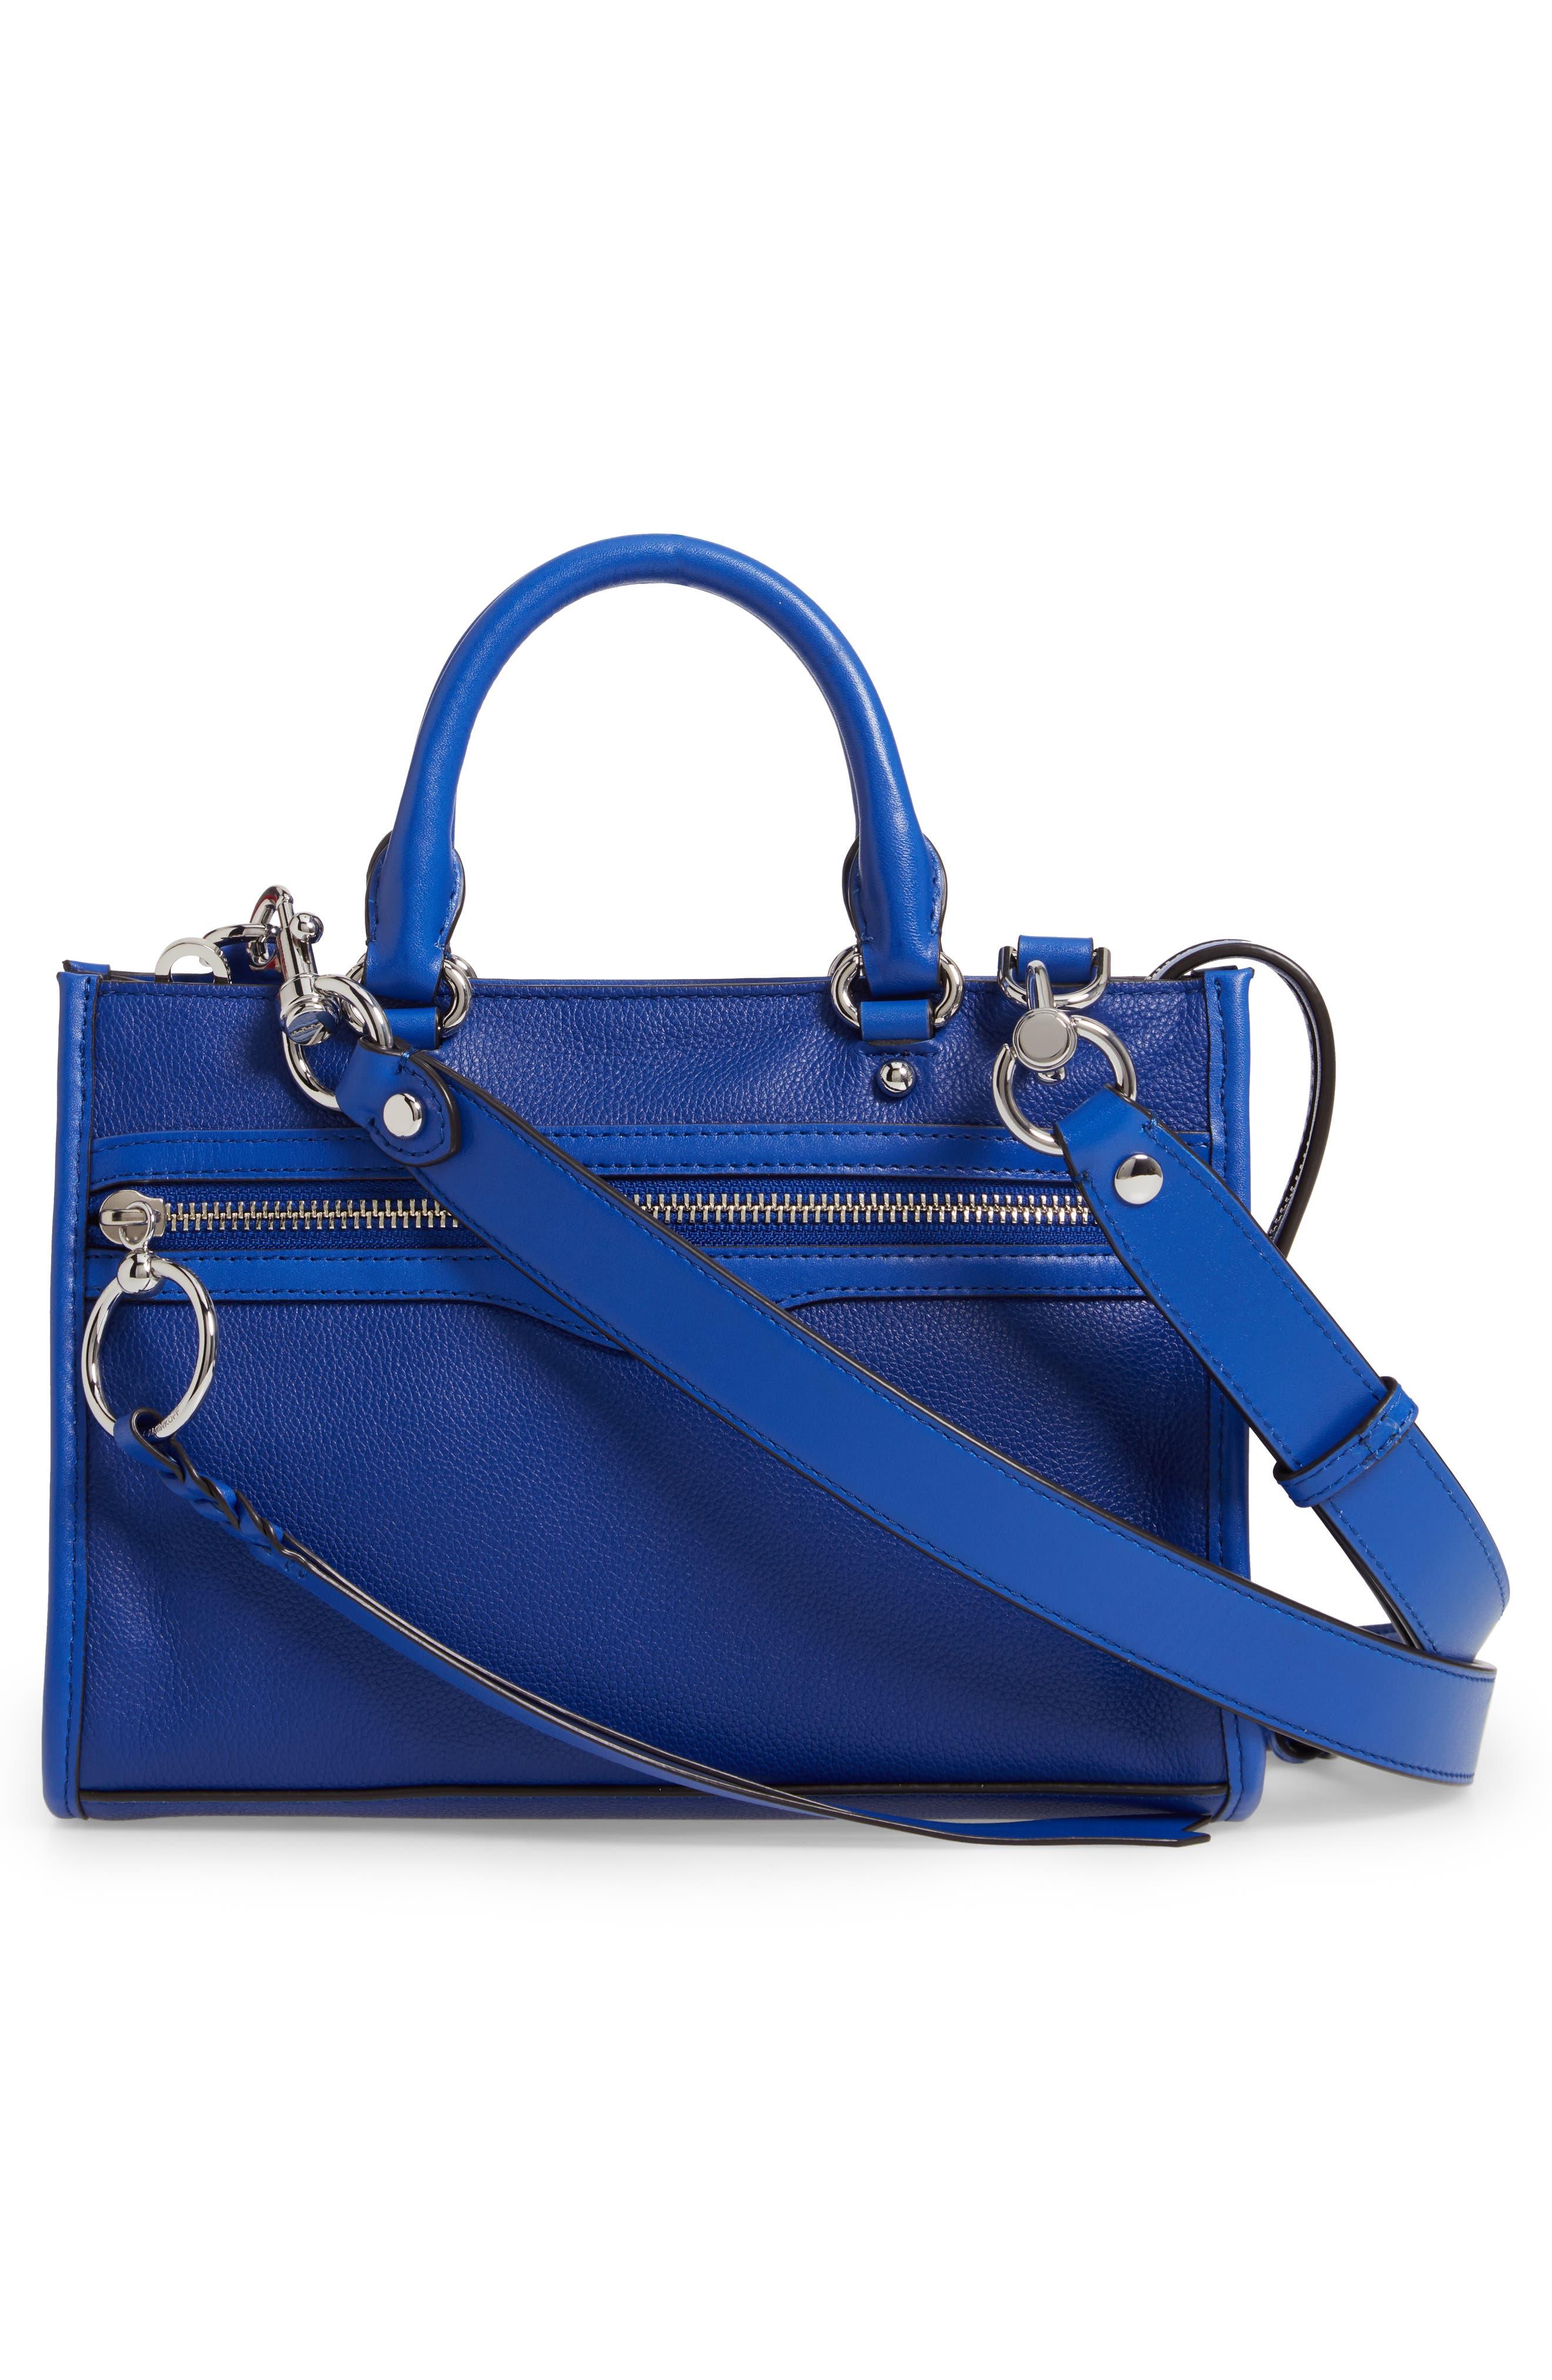 REBECCA MINKOFF, Micro Bedford Leather Satchel, Alternate thumbnail 4, color, BRIGHT BLUE